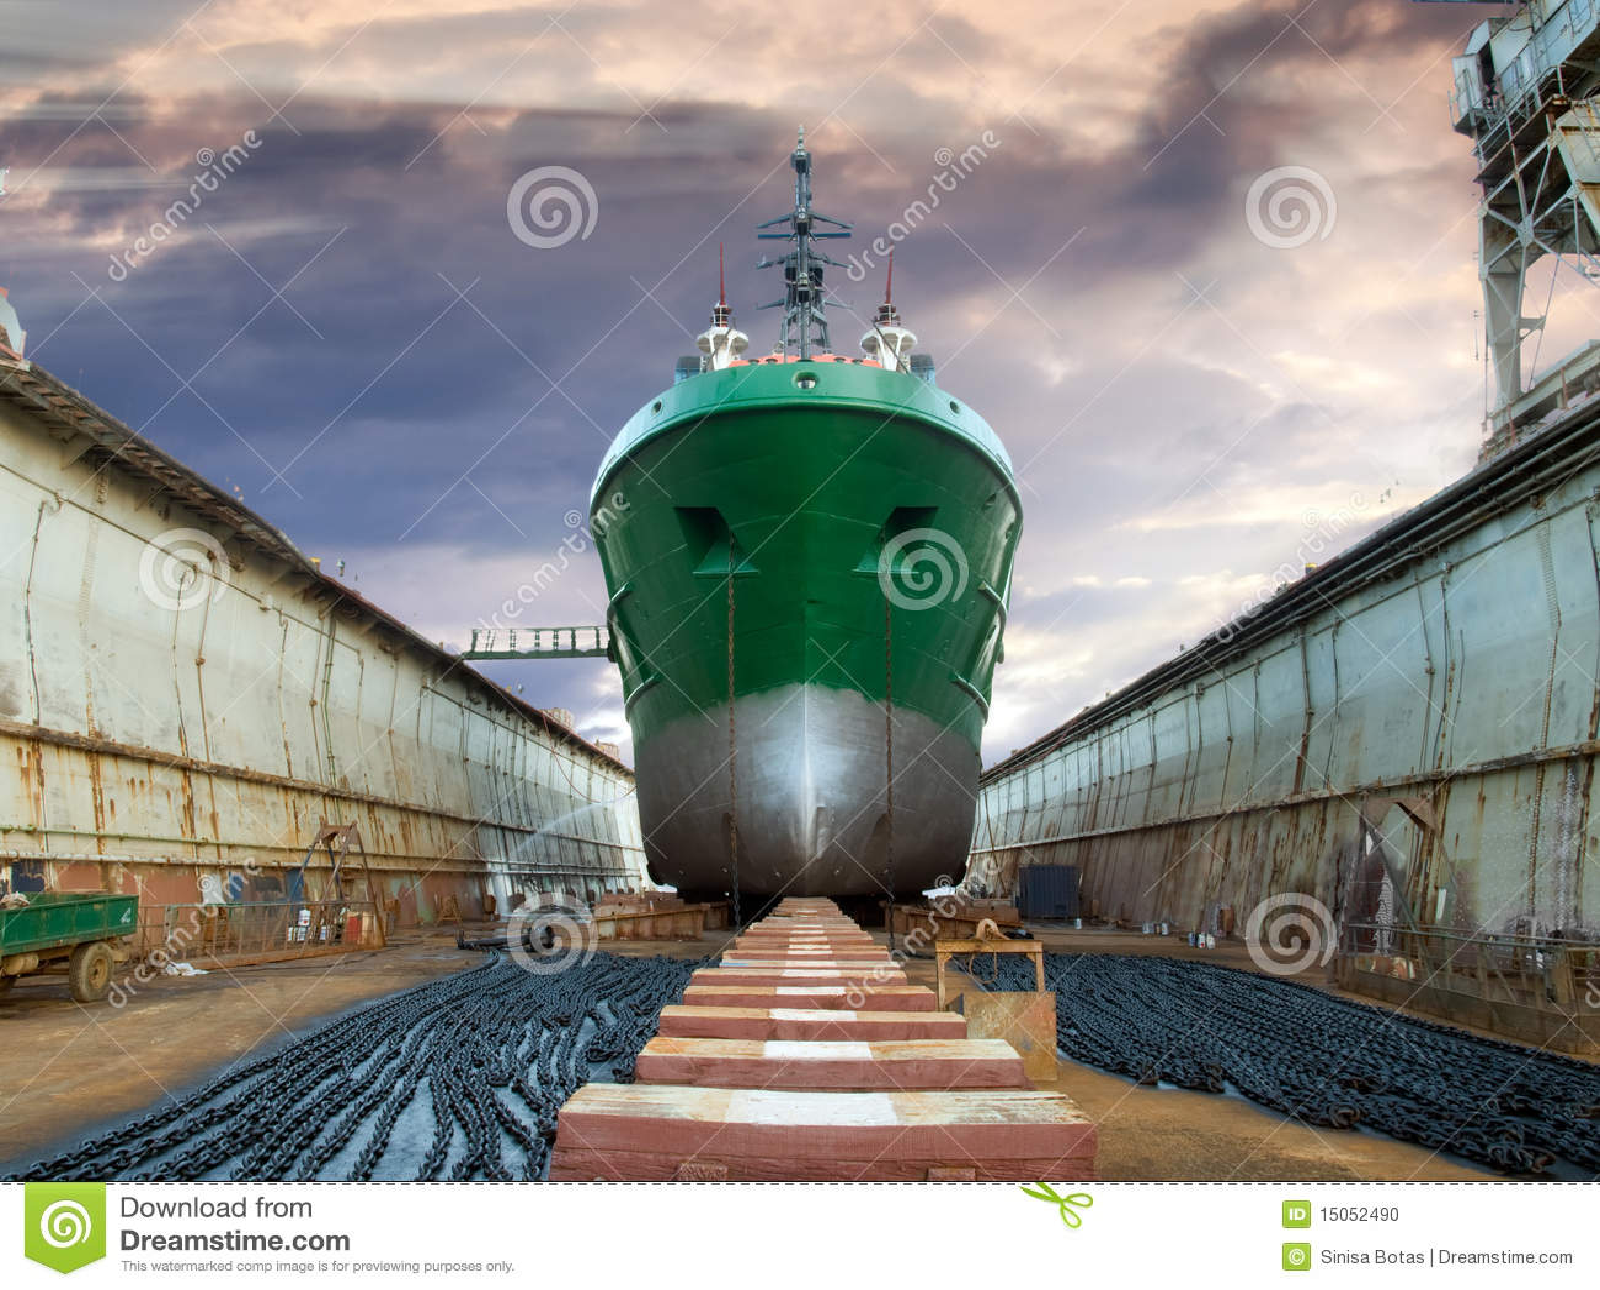 graving dock stock photo image of cargo nautical crane 15052490